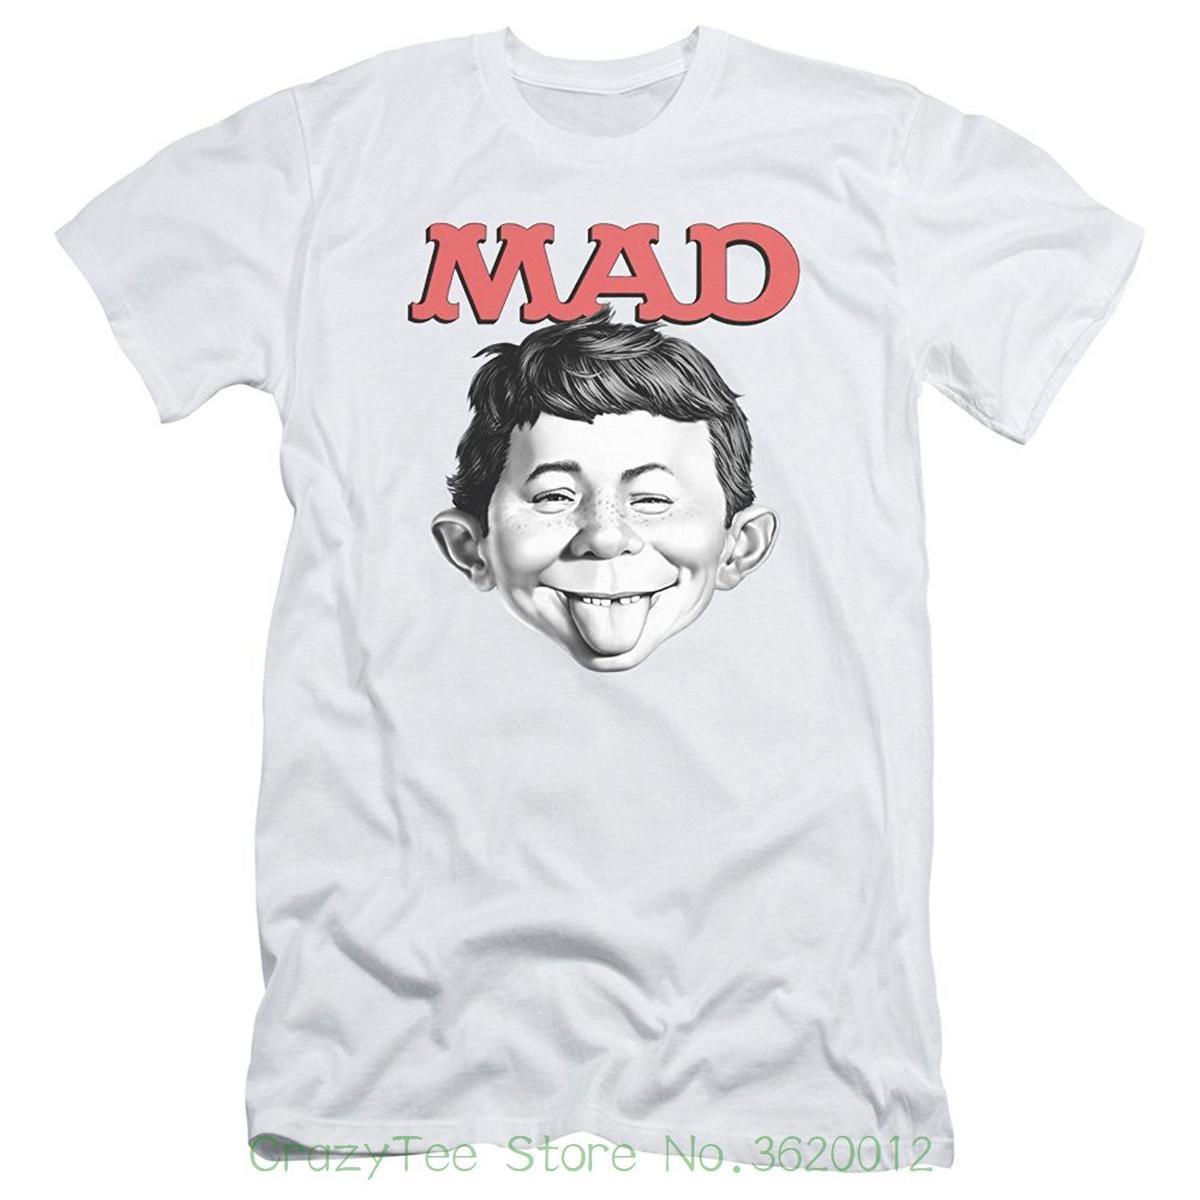 828de97f98eac1 Acquista Magliette Divertenti In Cotone A Manica Corta Mad Magazine Media  Satira Humor Pop Culture U Mad Adult Slim T Shirt Tee A $15.53 Dal  Liguo0034 ...